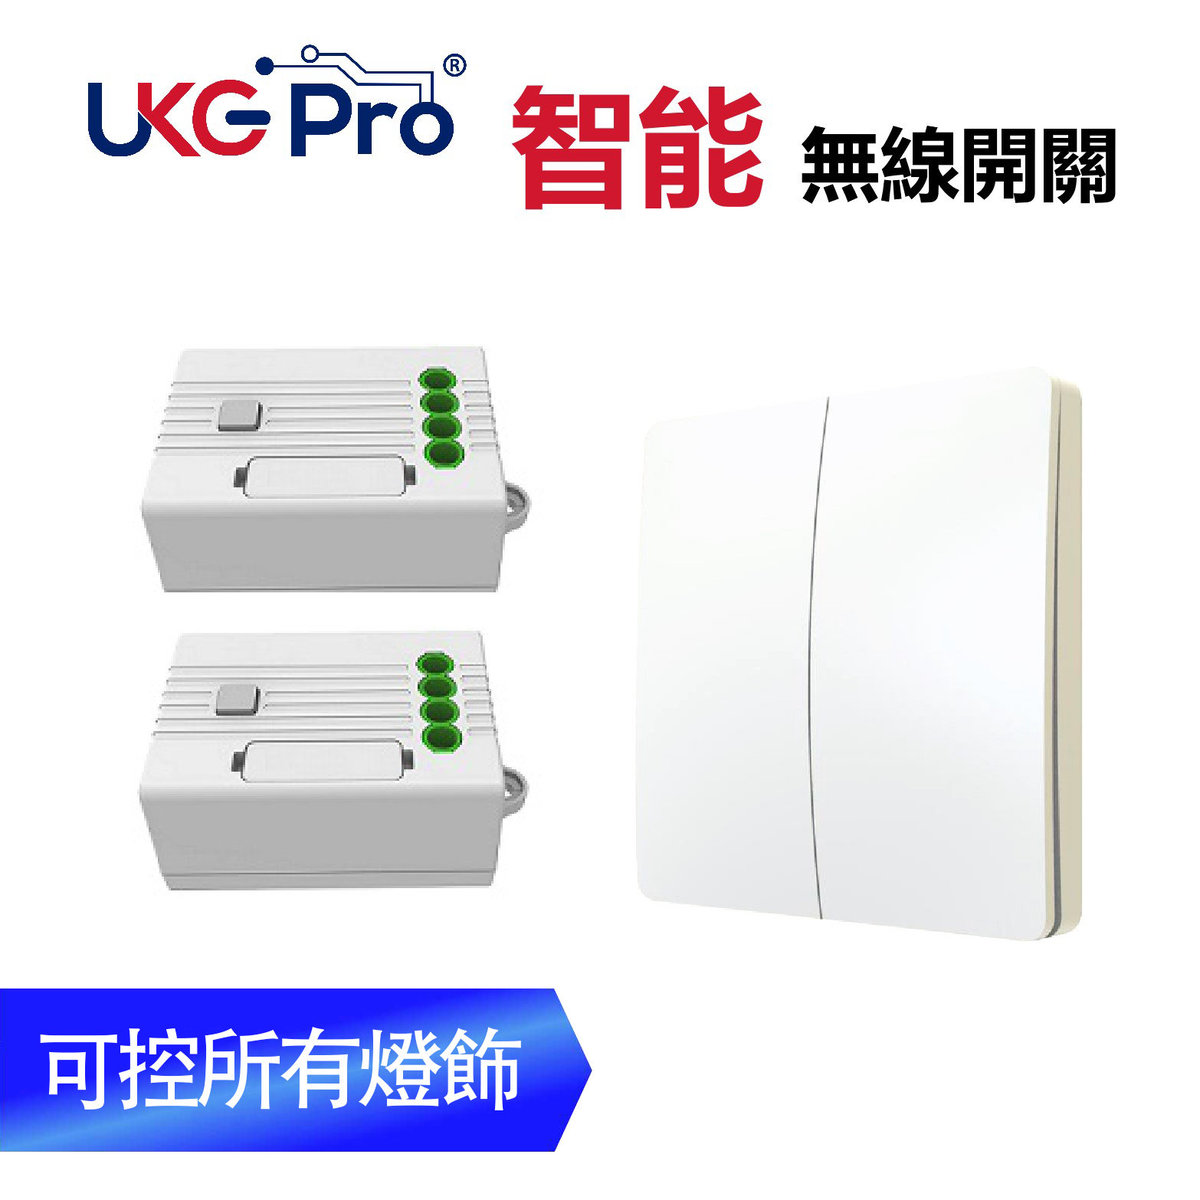 KinSwitch-1路動能RF&WiFi接收控制器+動能無線雙位白色覆位開關 (型號: U-ERC309-ES2254-WH)